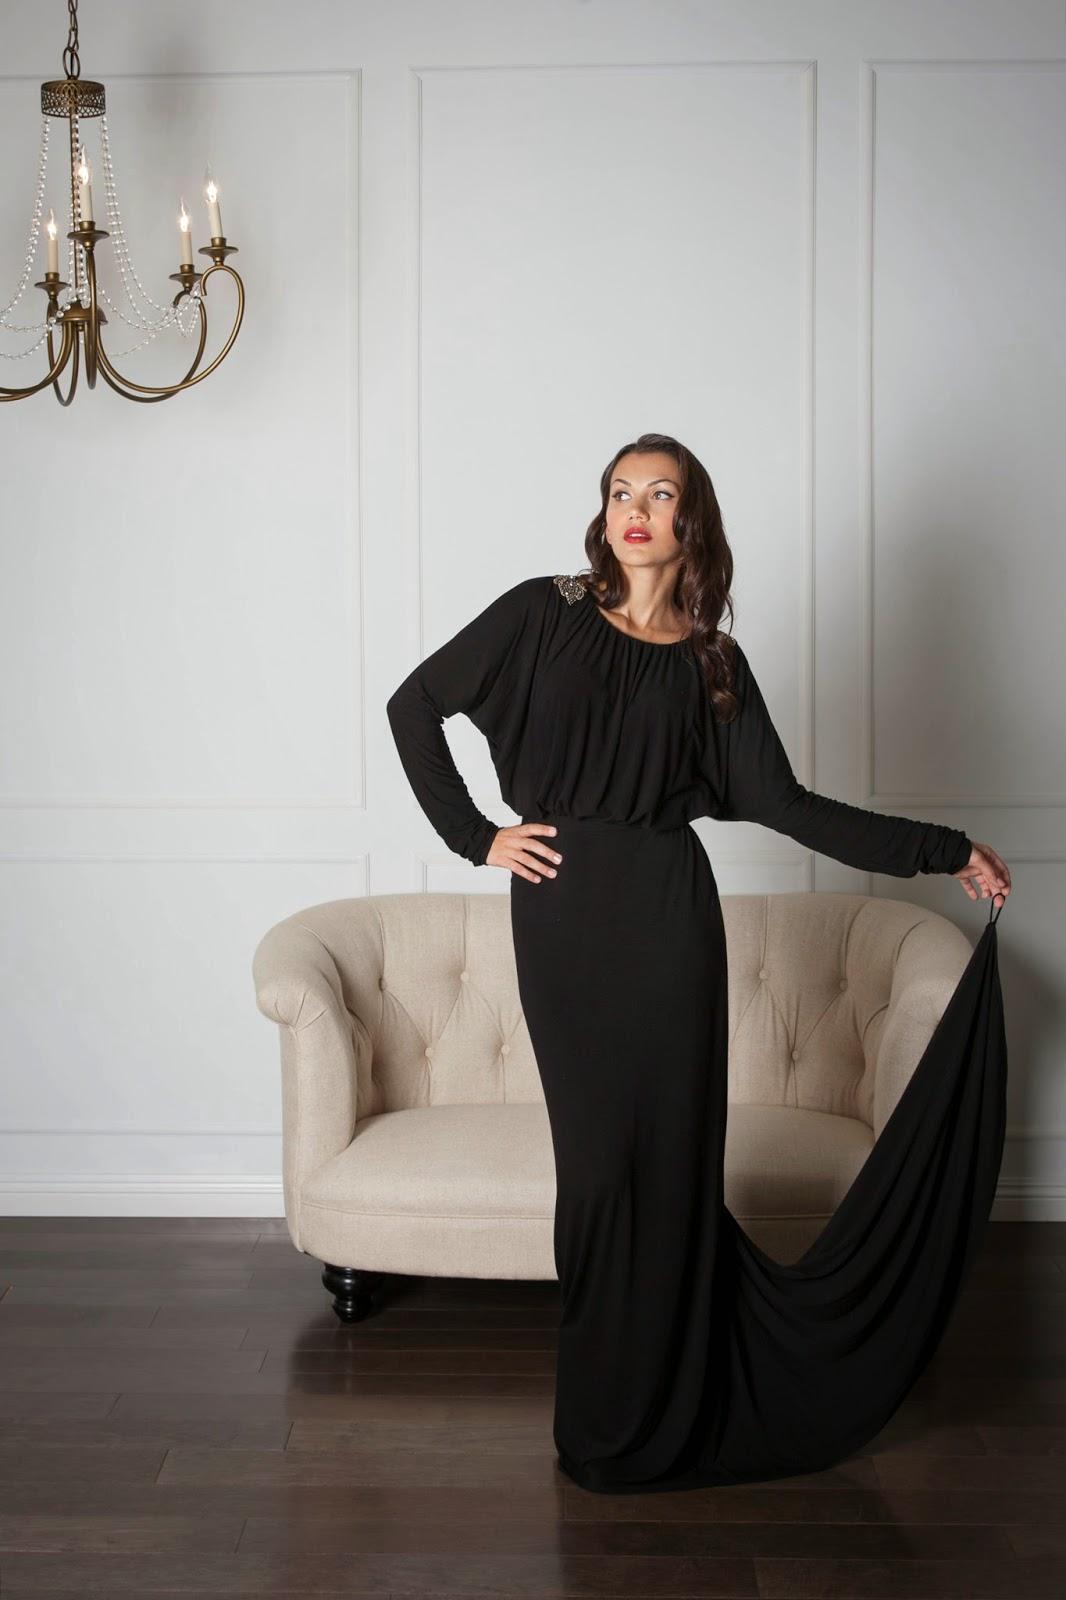 Modest long sleeve formal wear by Rayan   Mode-sty hijab tznius fashion